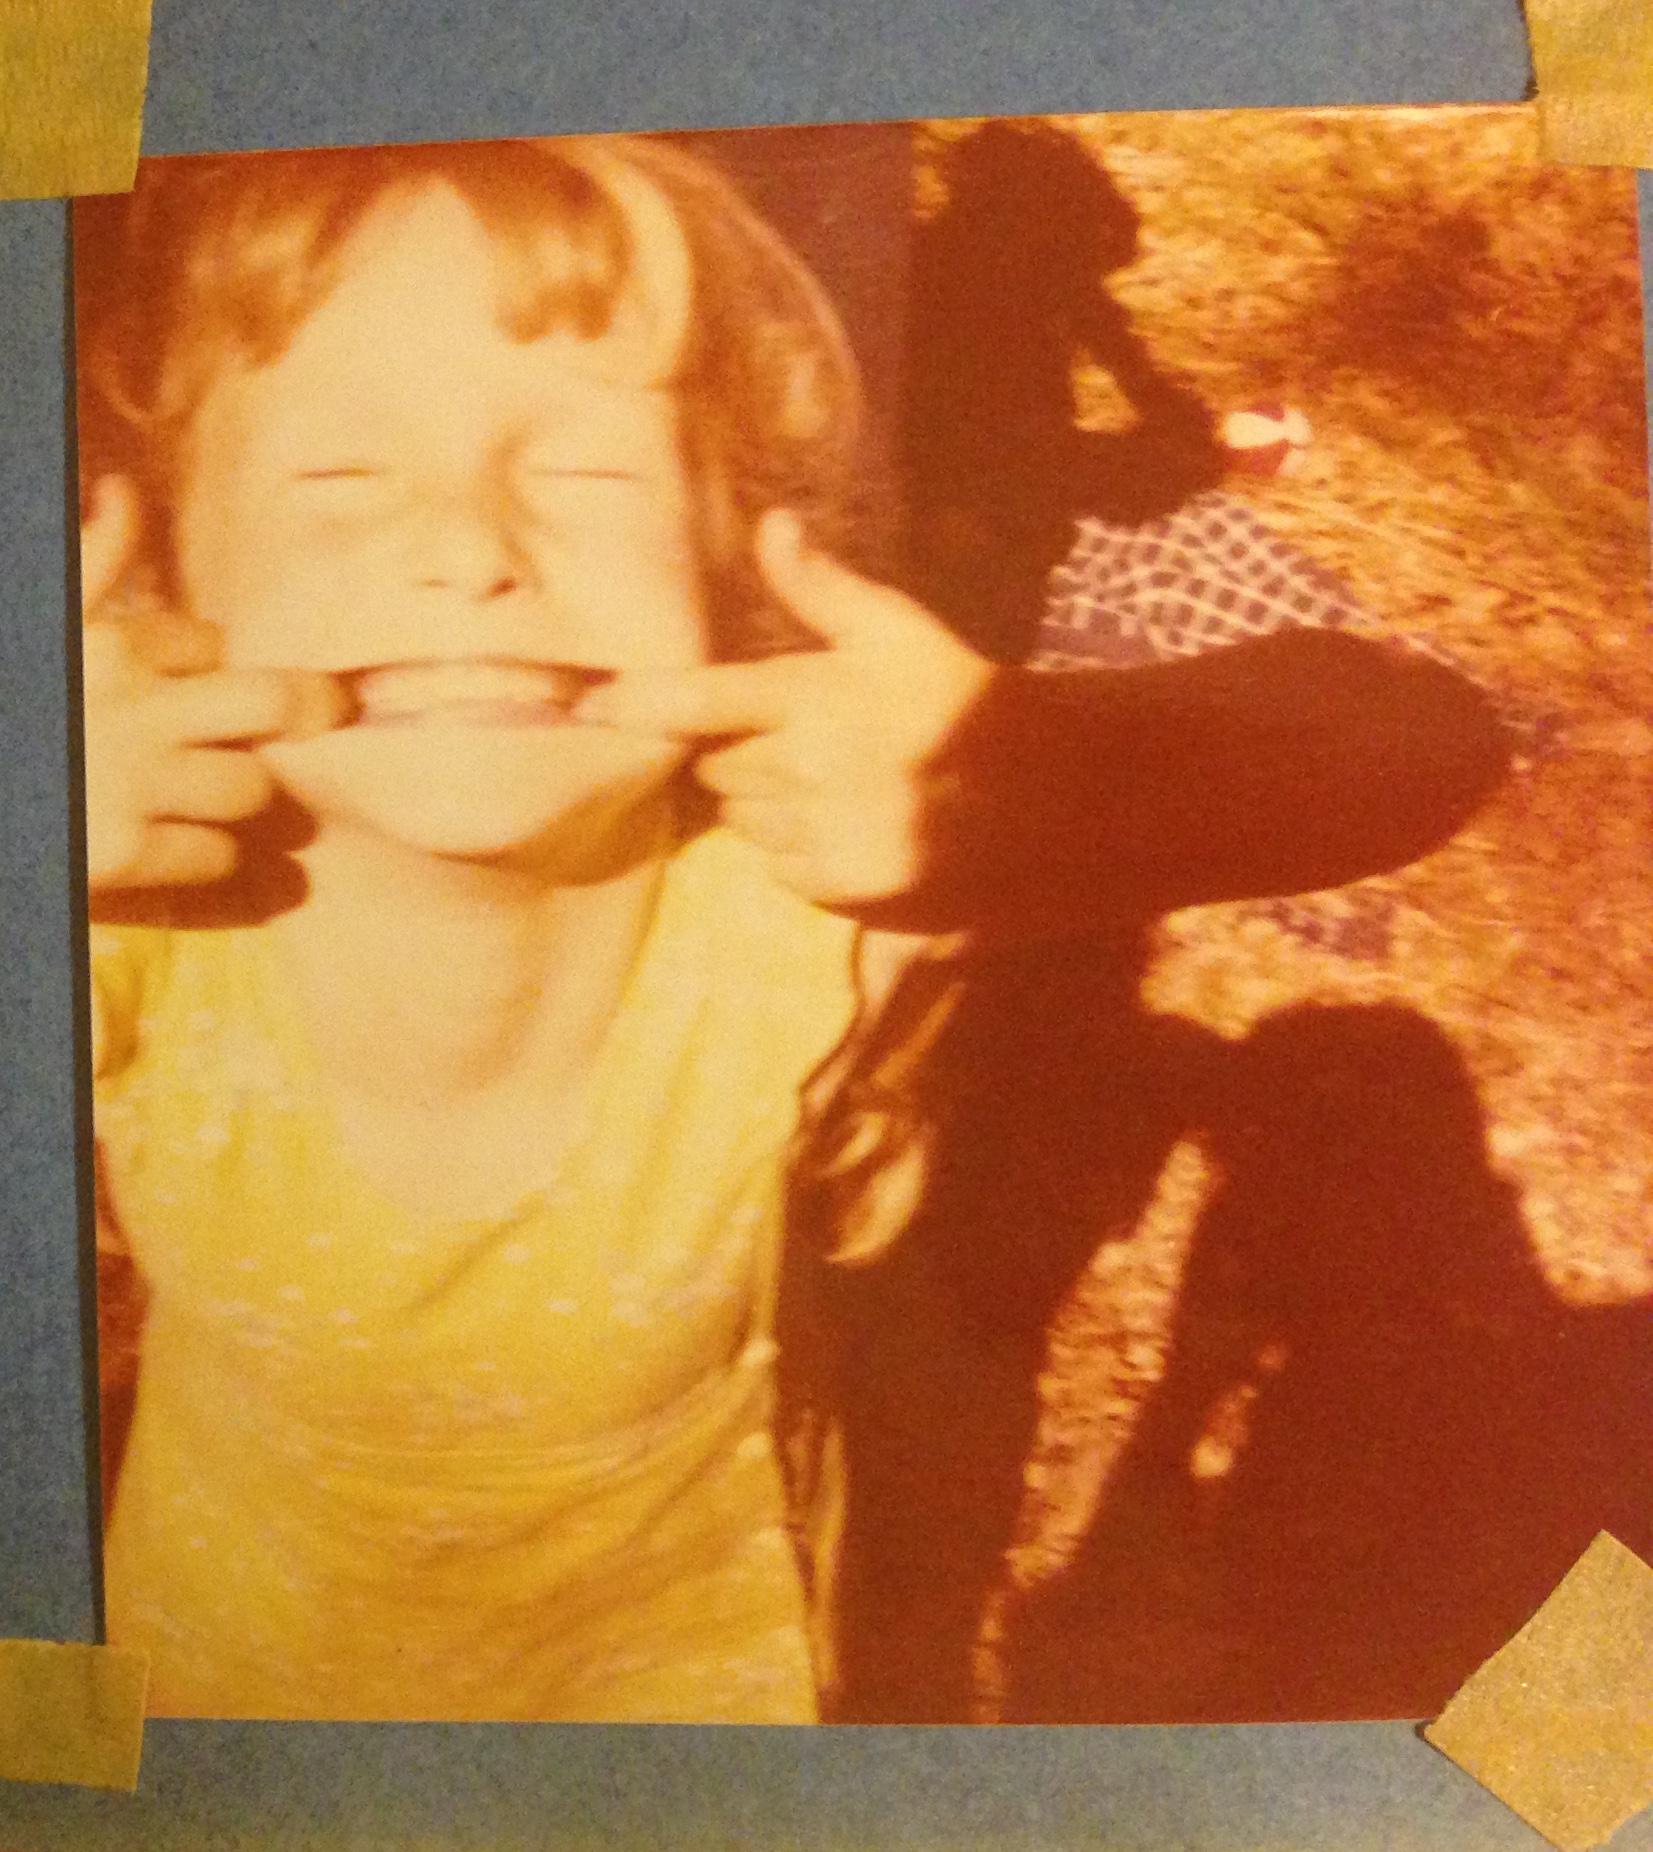 Photos from Dad's album 1 copy a